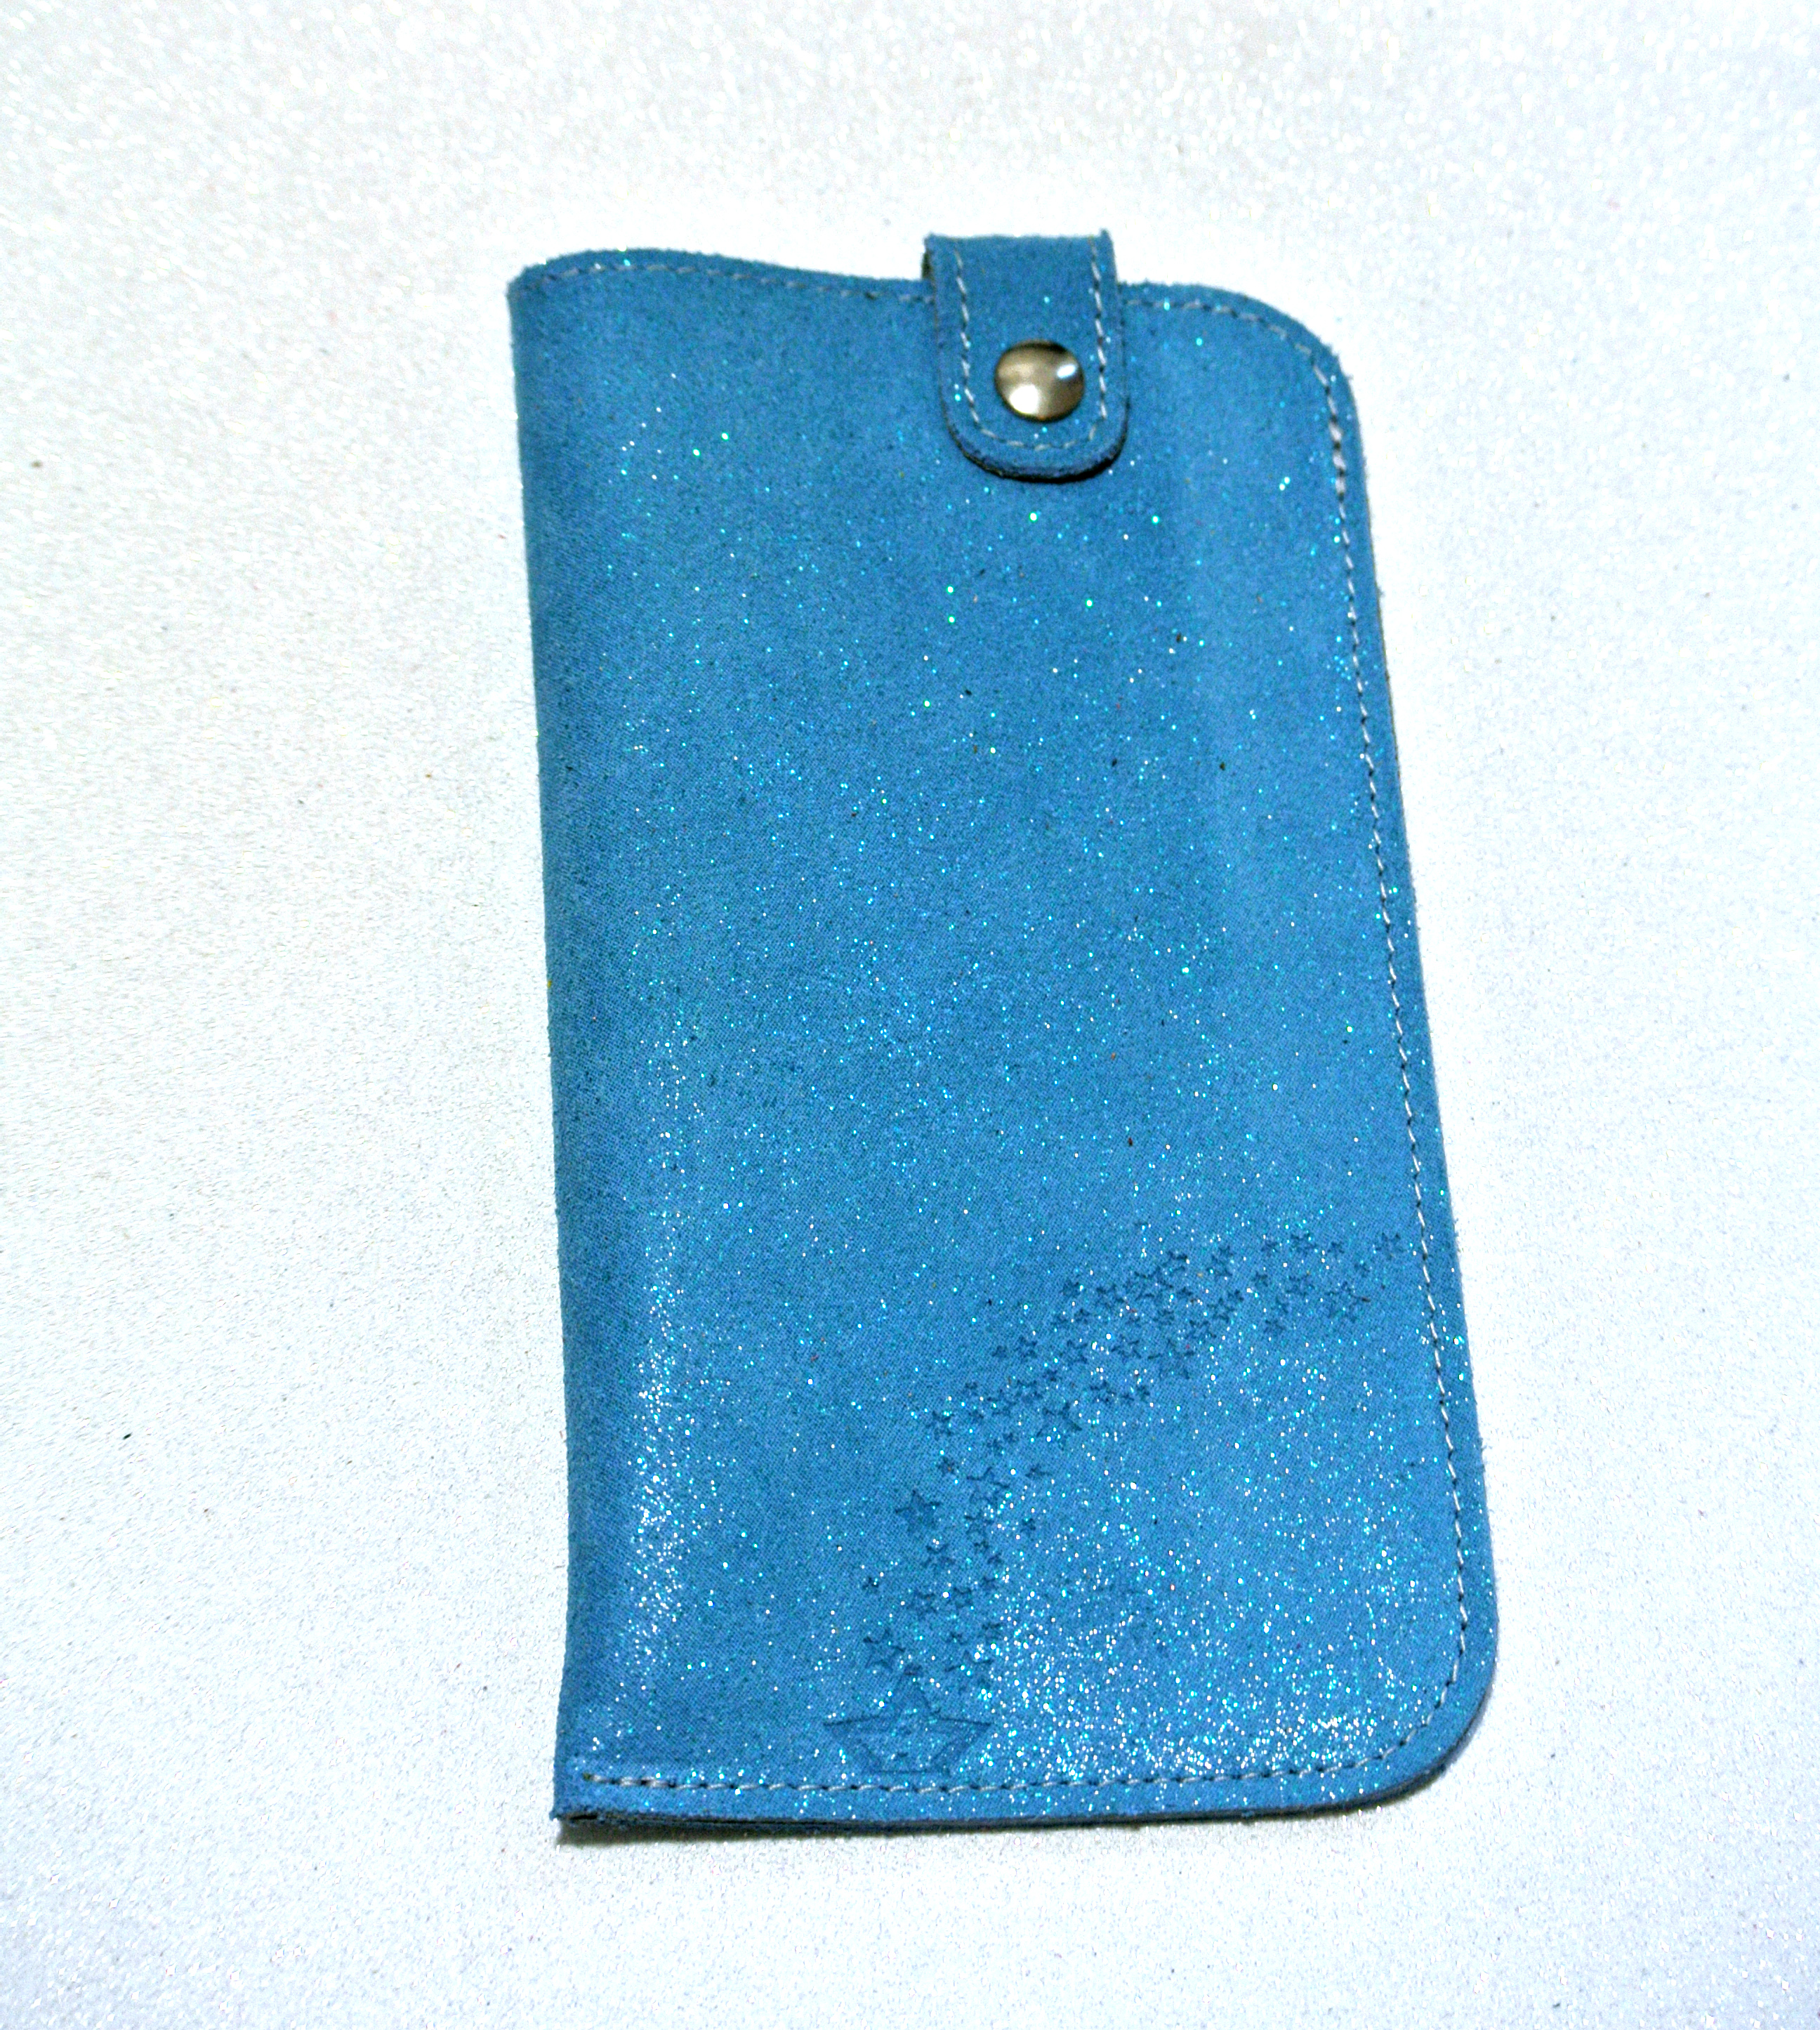 coque iphone 8 bleu azur